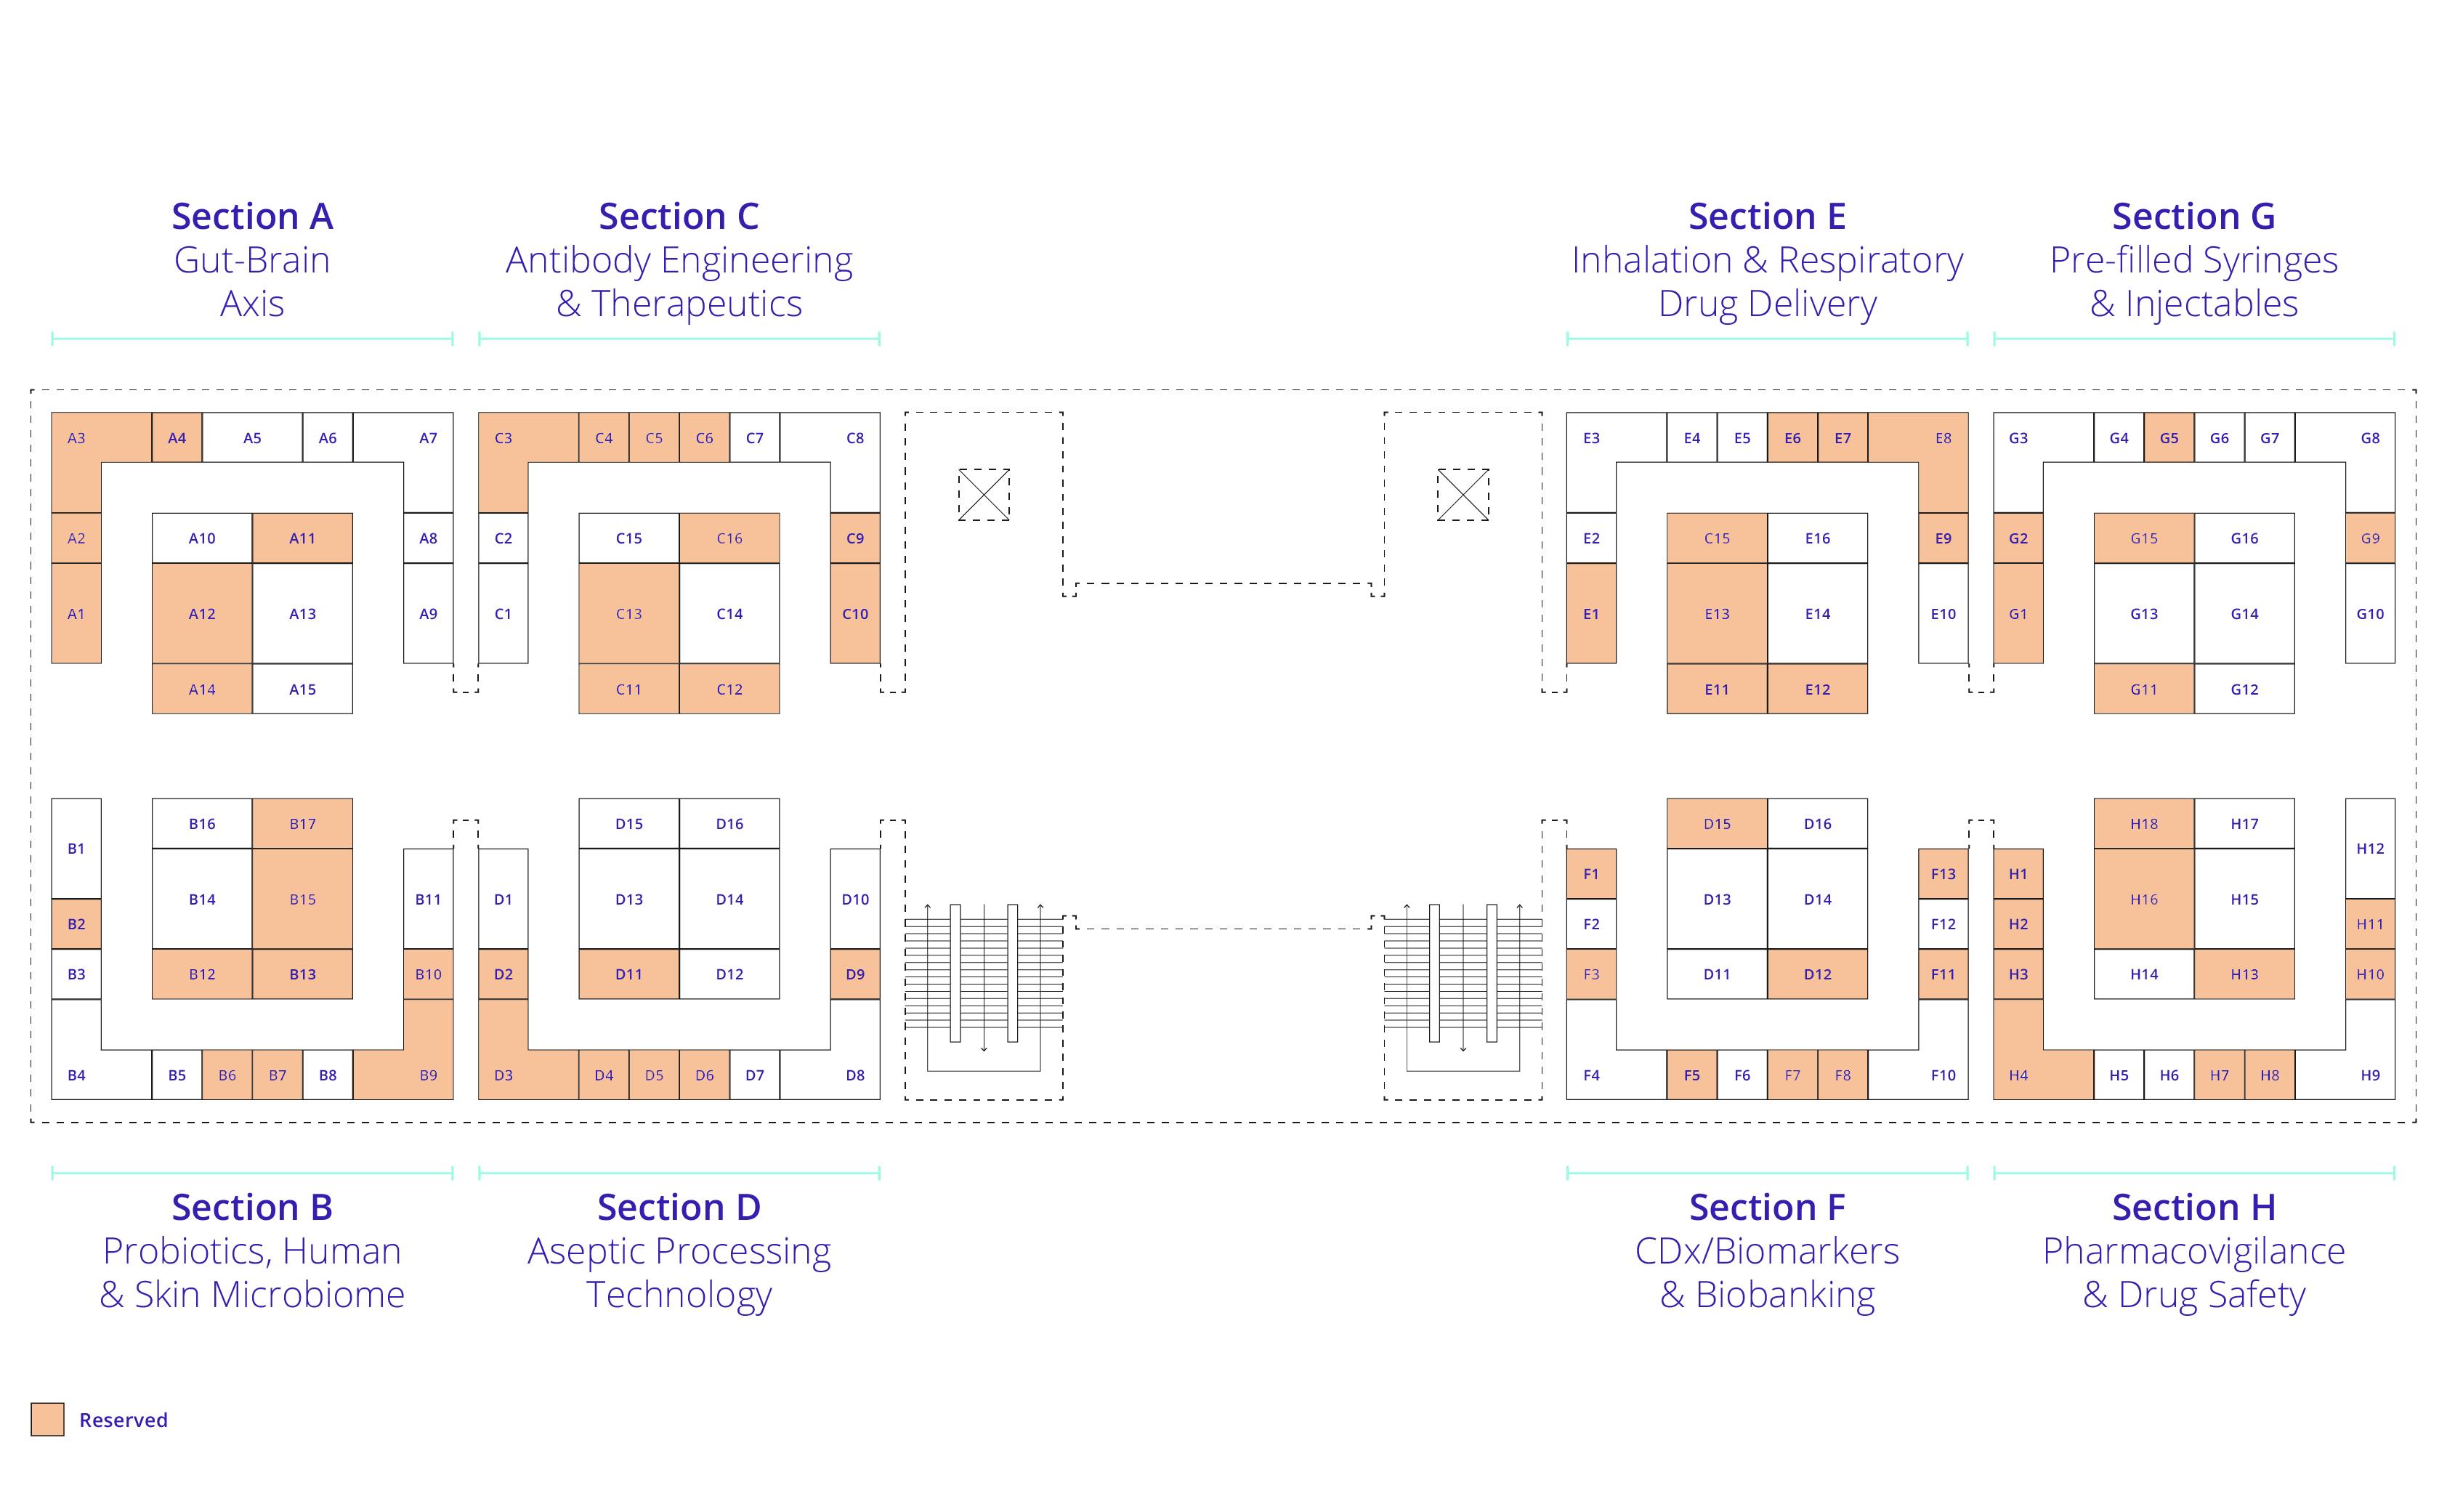 Plant_BioTech_Pharma_Summit_2021_Sponsor_September_Porto